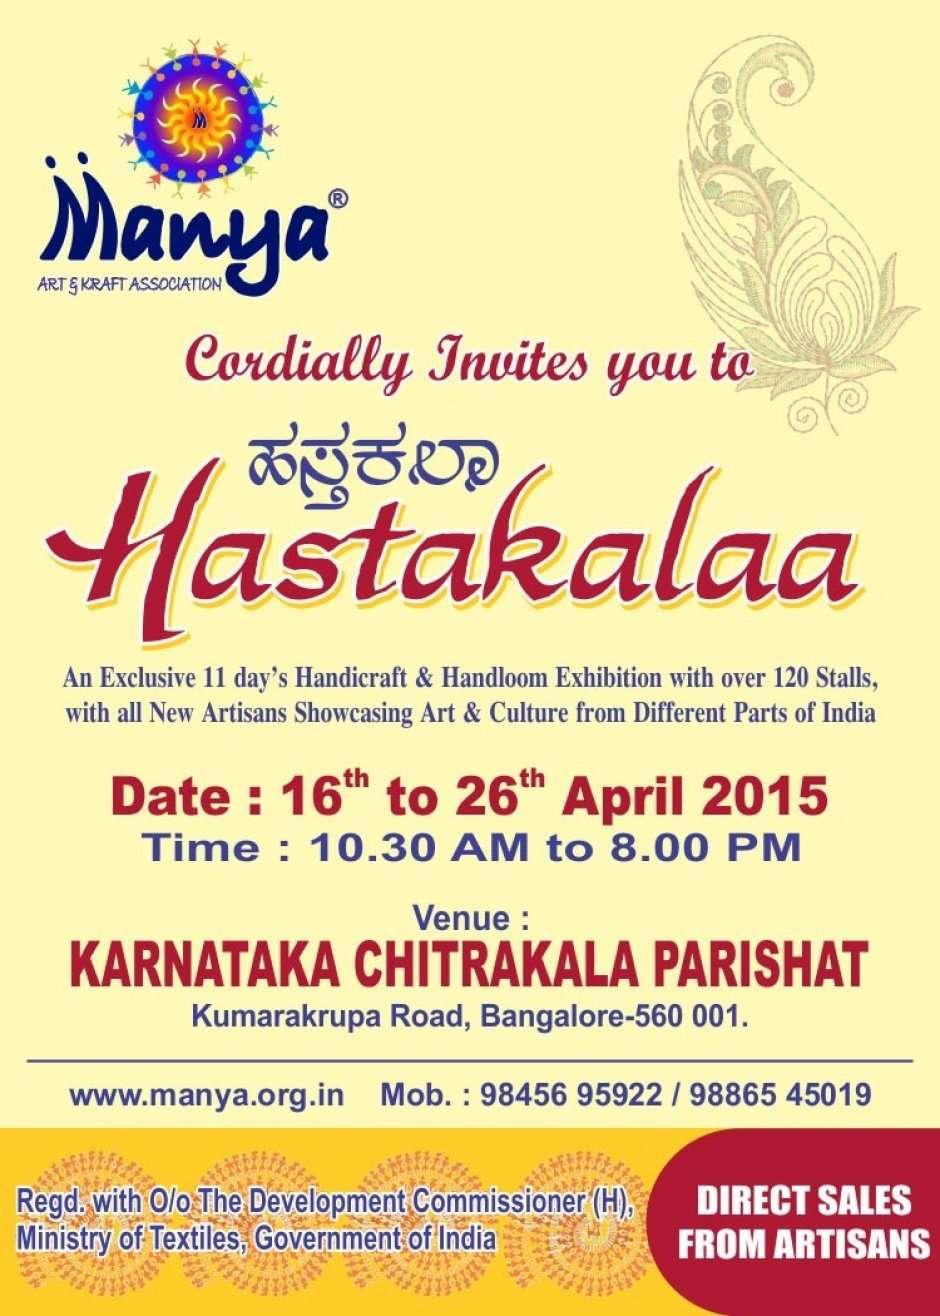 Hastakalaa Handicraft and Handloom Exhibition in Bangalore